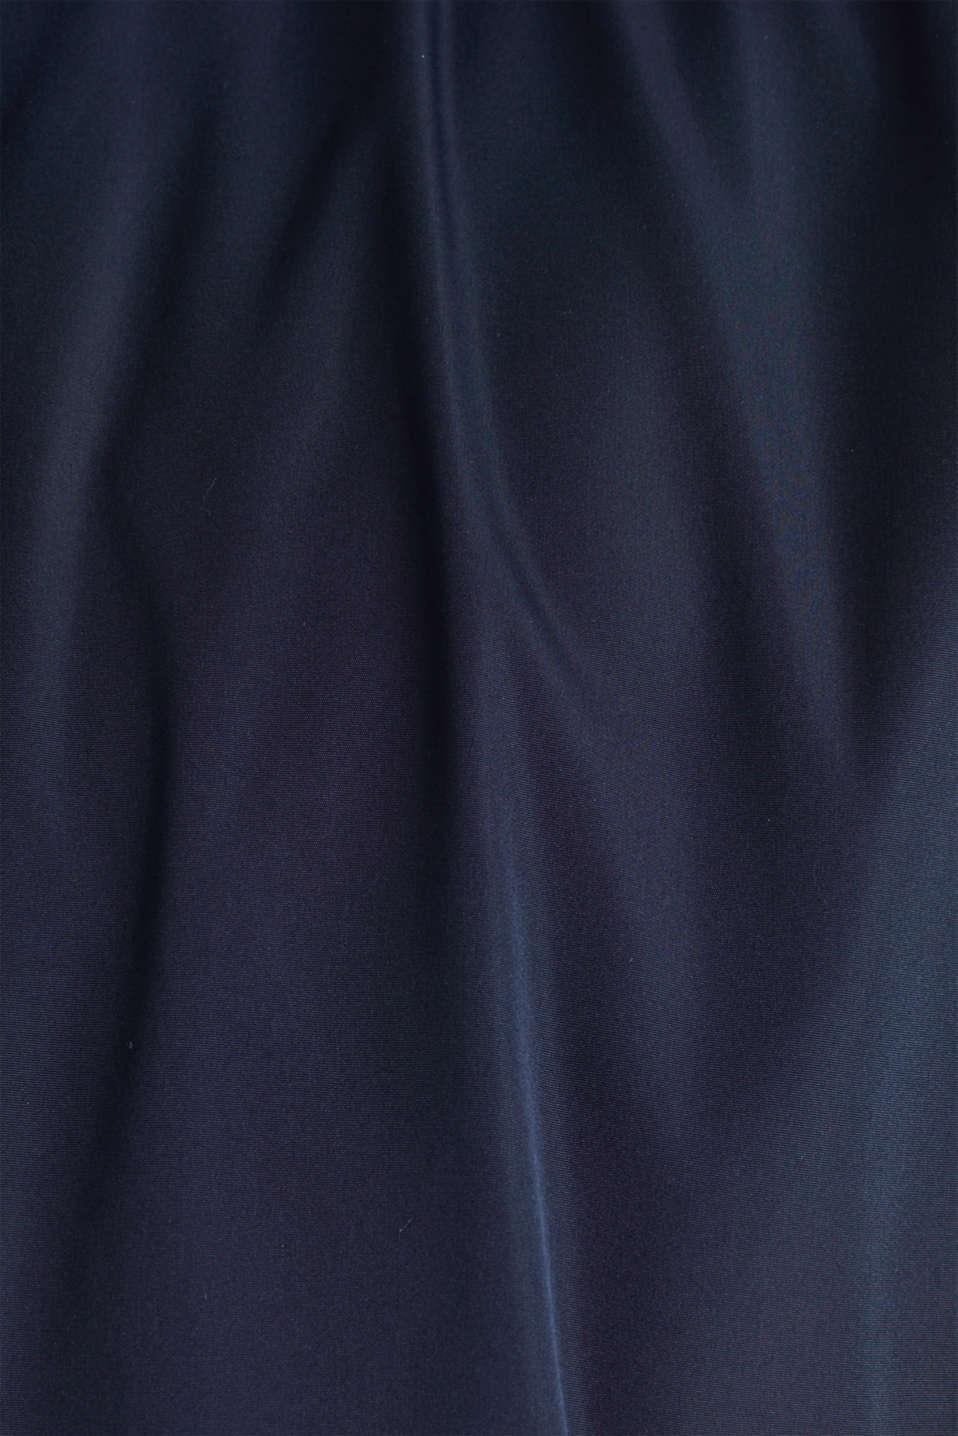 Nylon bomber jacket with a hood, DARK BLUE, detail image number 5